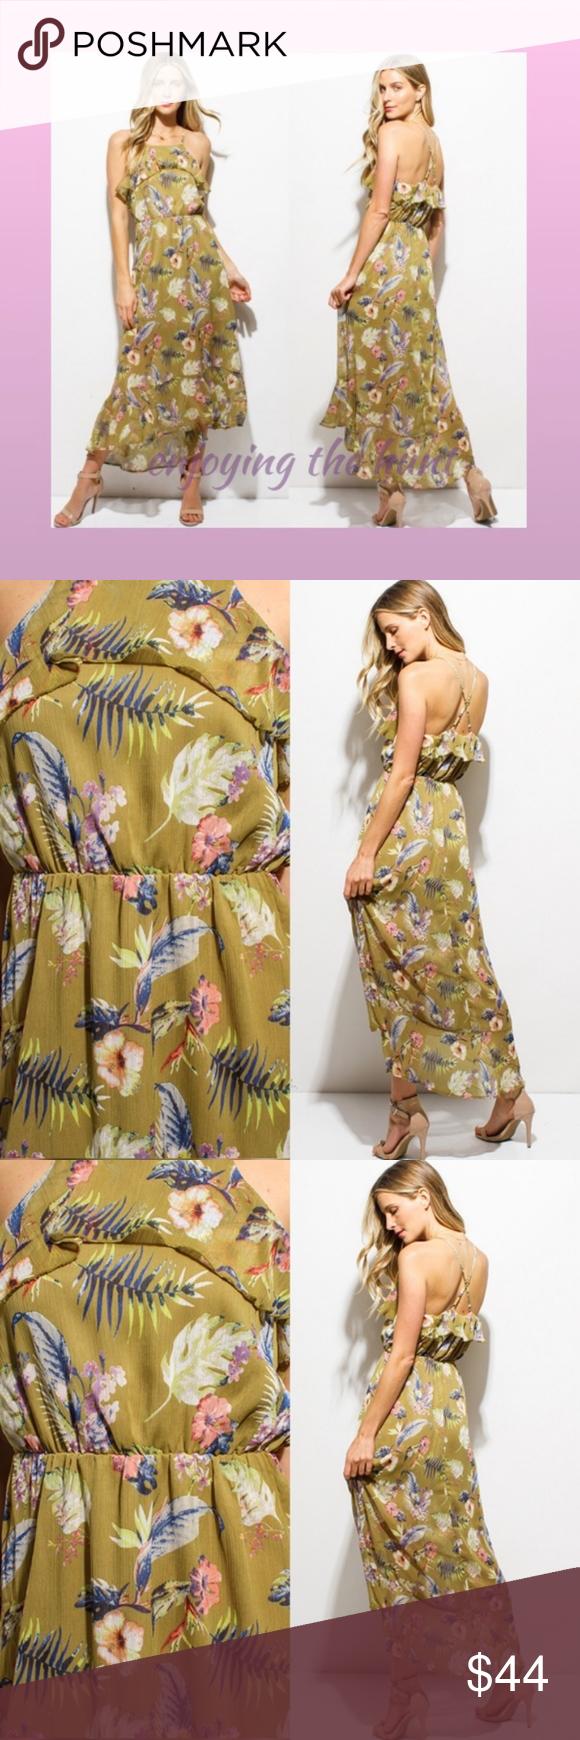 Floral ruffled maxi dress homecoming boutique my posh closet